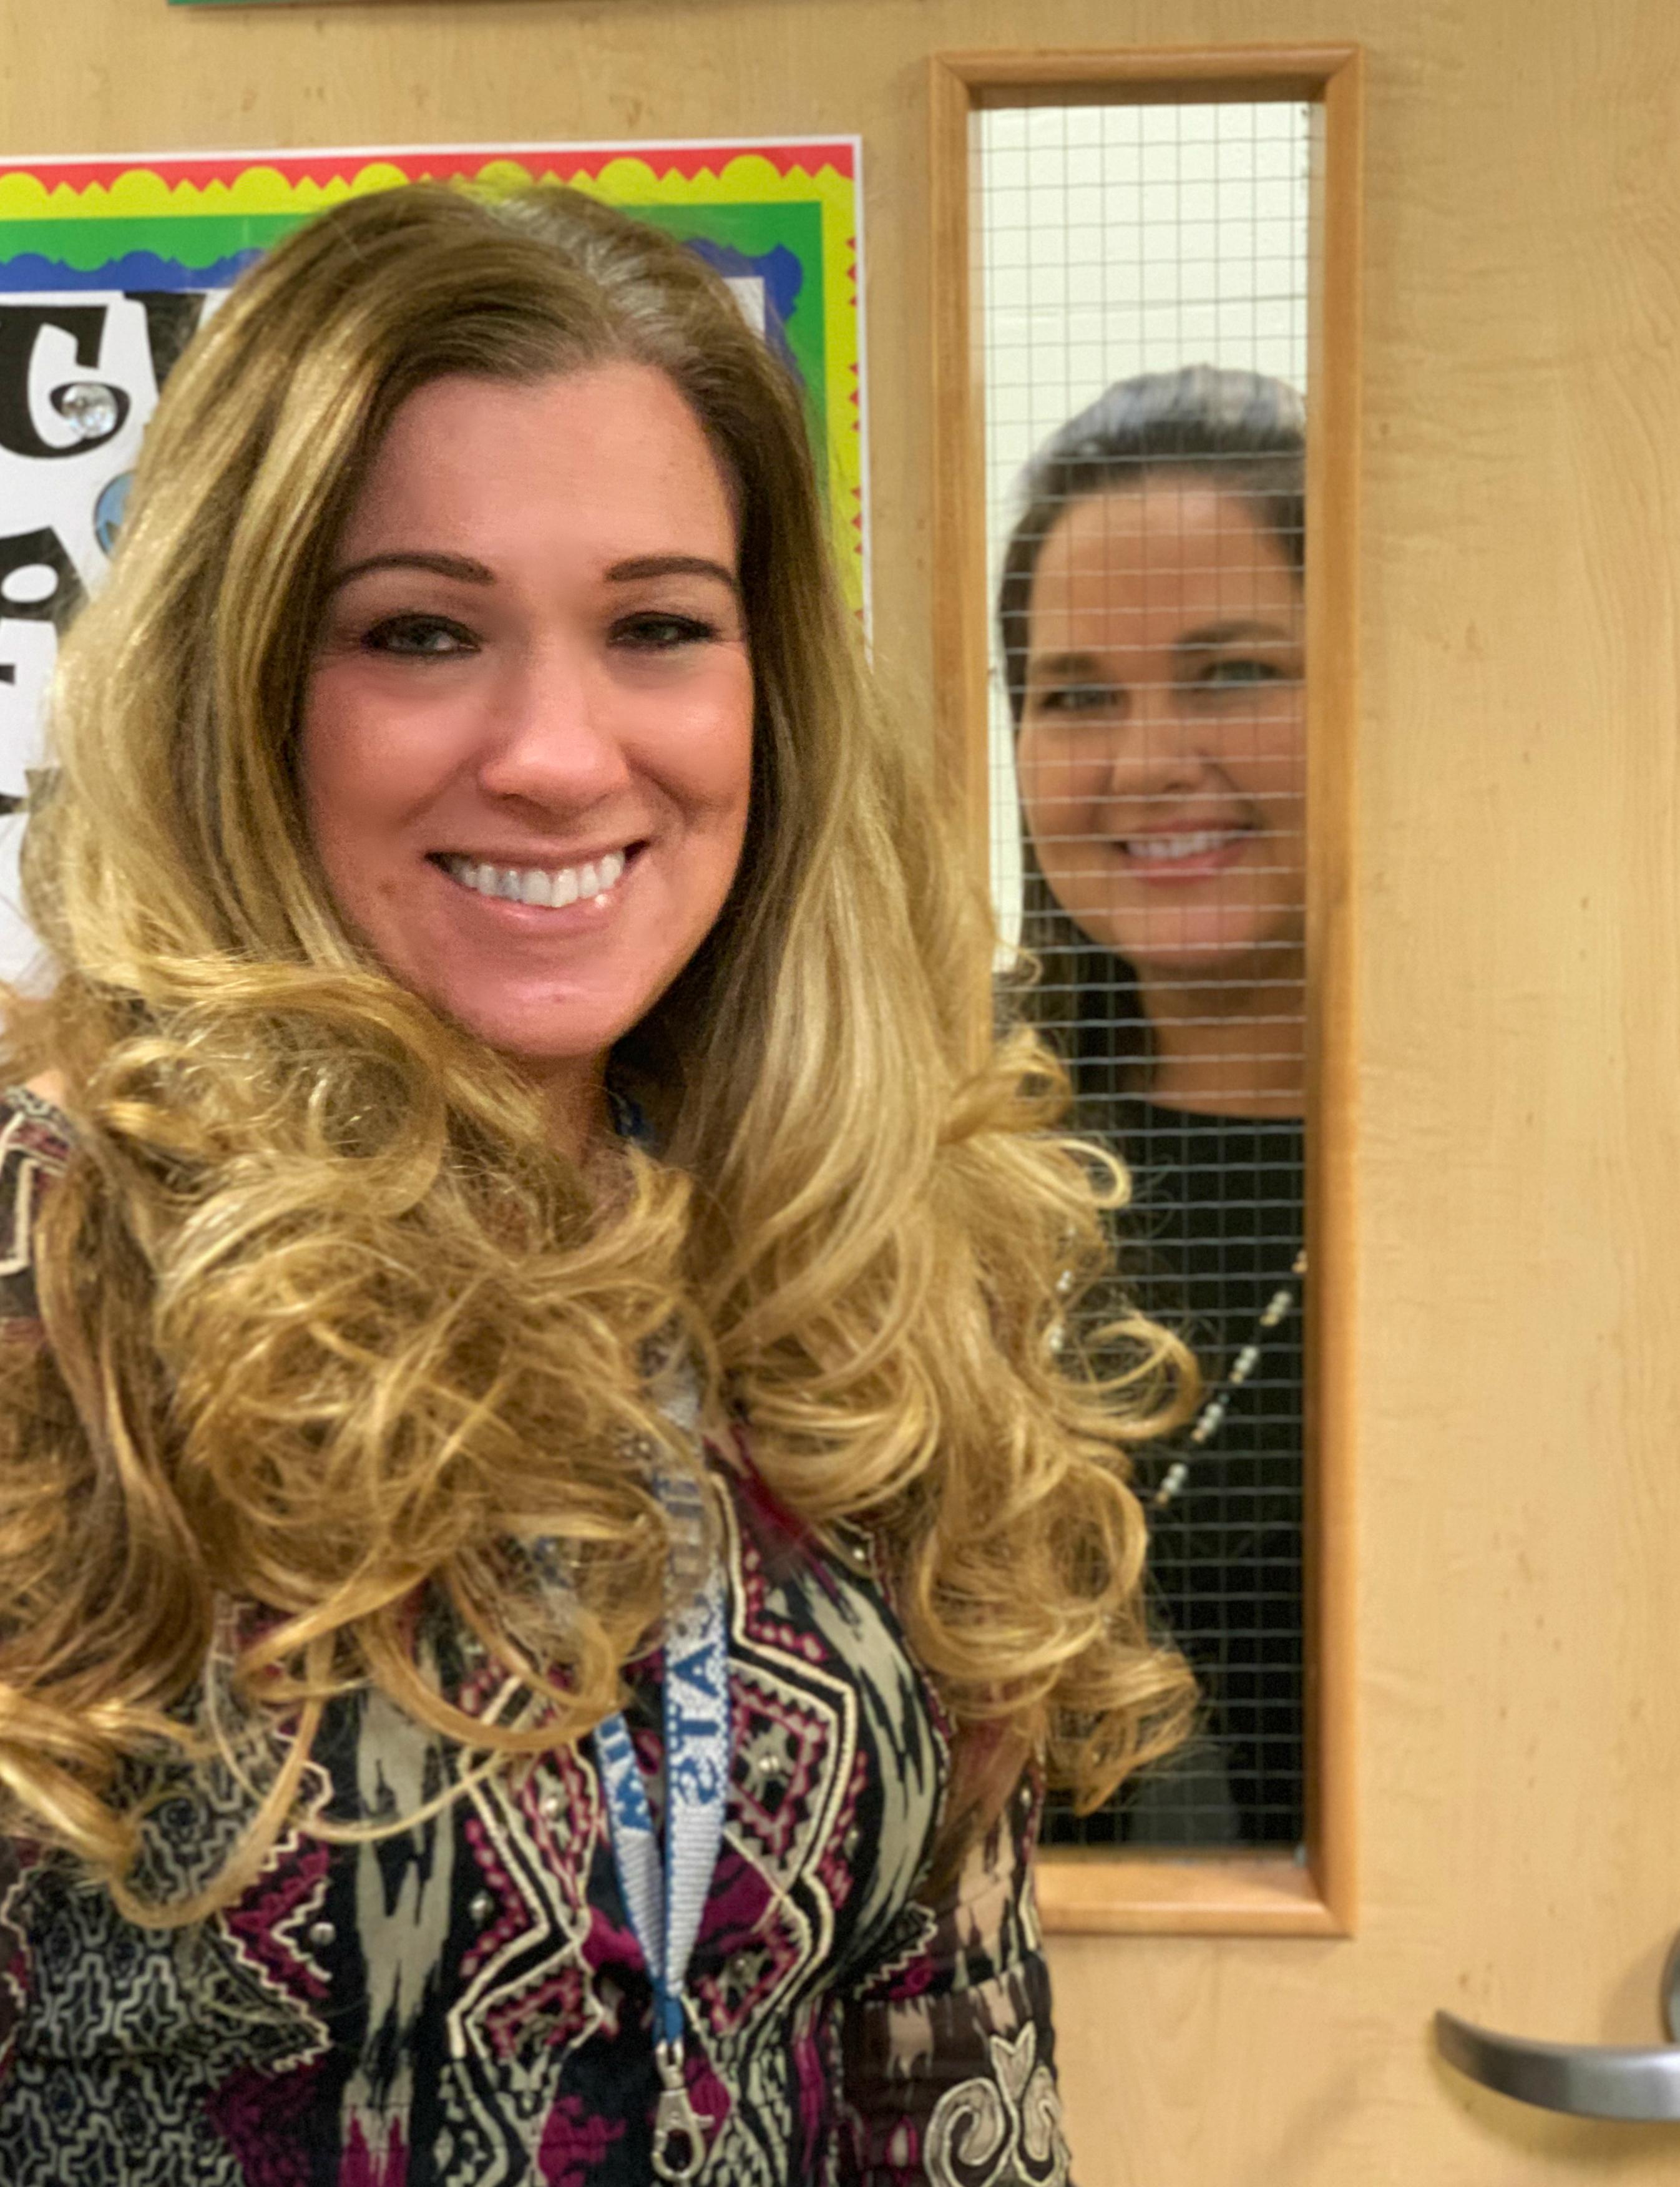 Left - Mrs. Crowhurst, PASS Teacher; Right - Mrs. Neely, PASS Paraprofessional